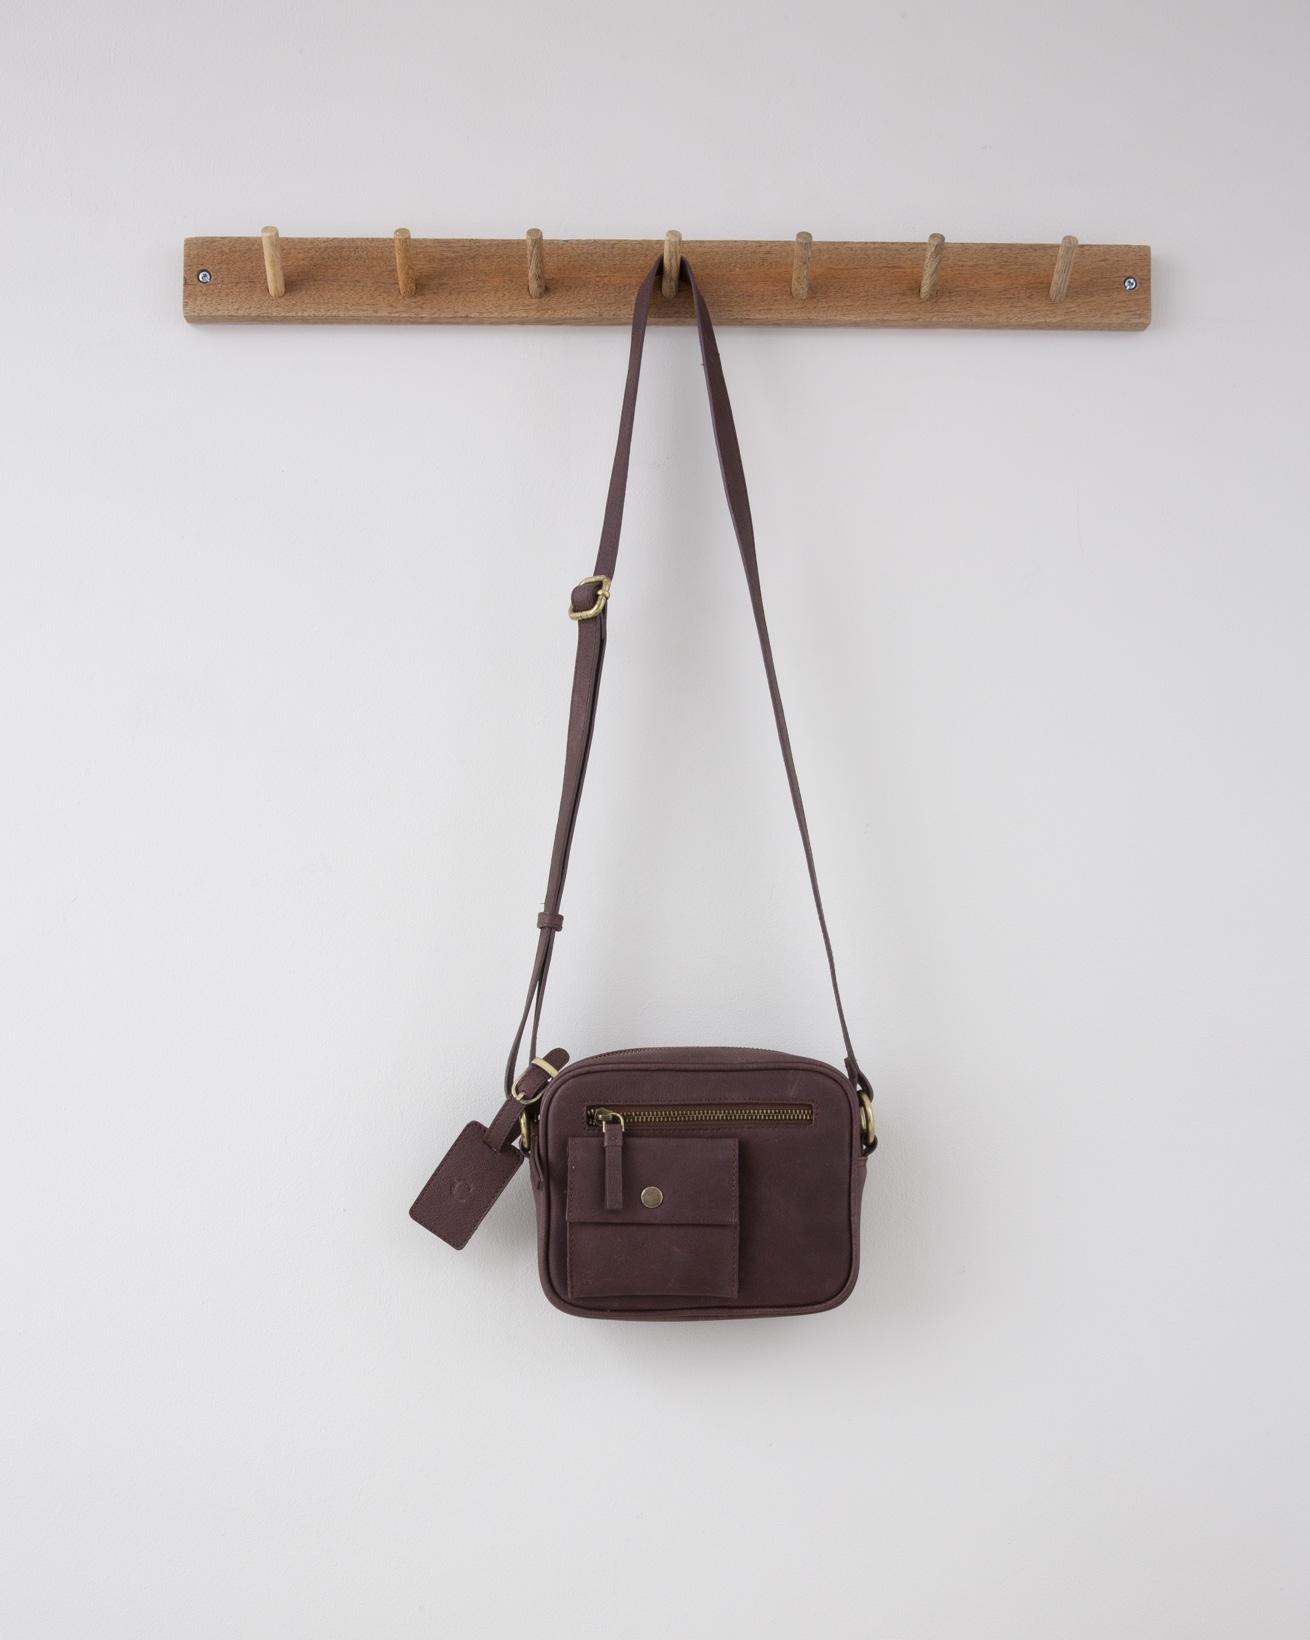 Small Zip up Cross Body Bag - 19cm x 16cm - Brandy - 1296